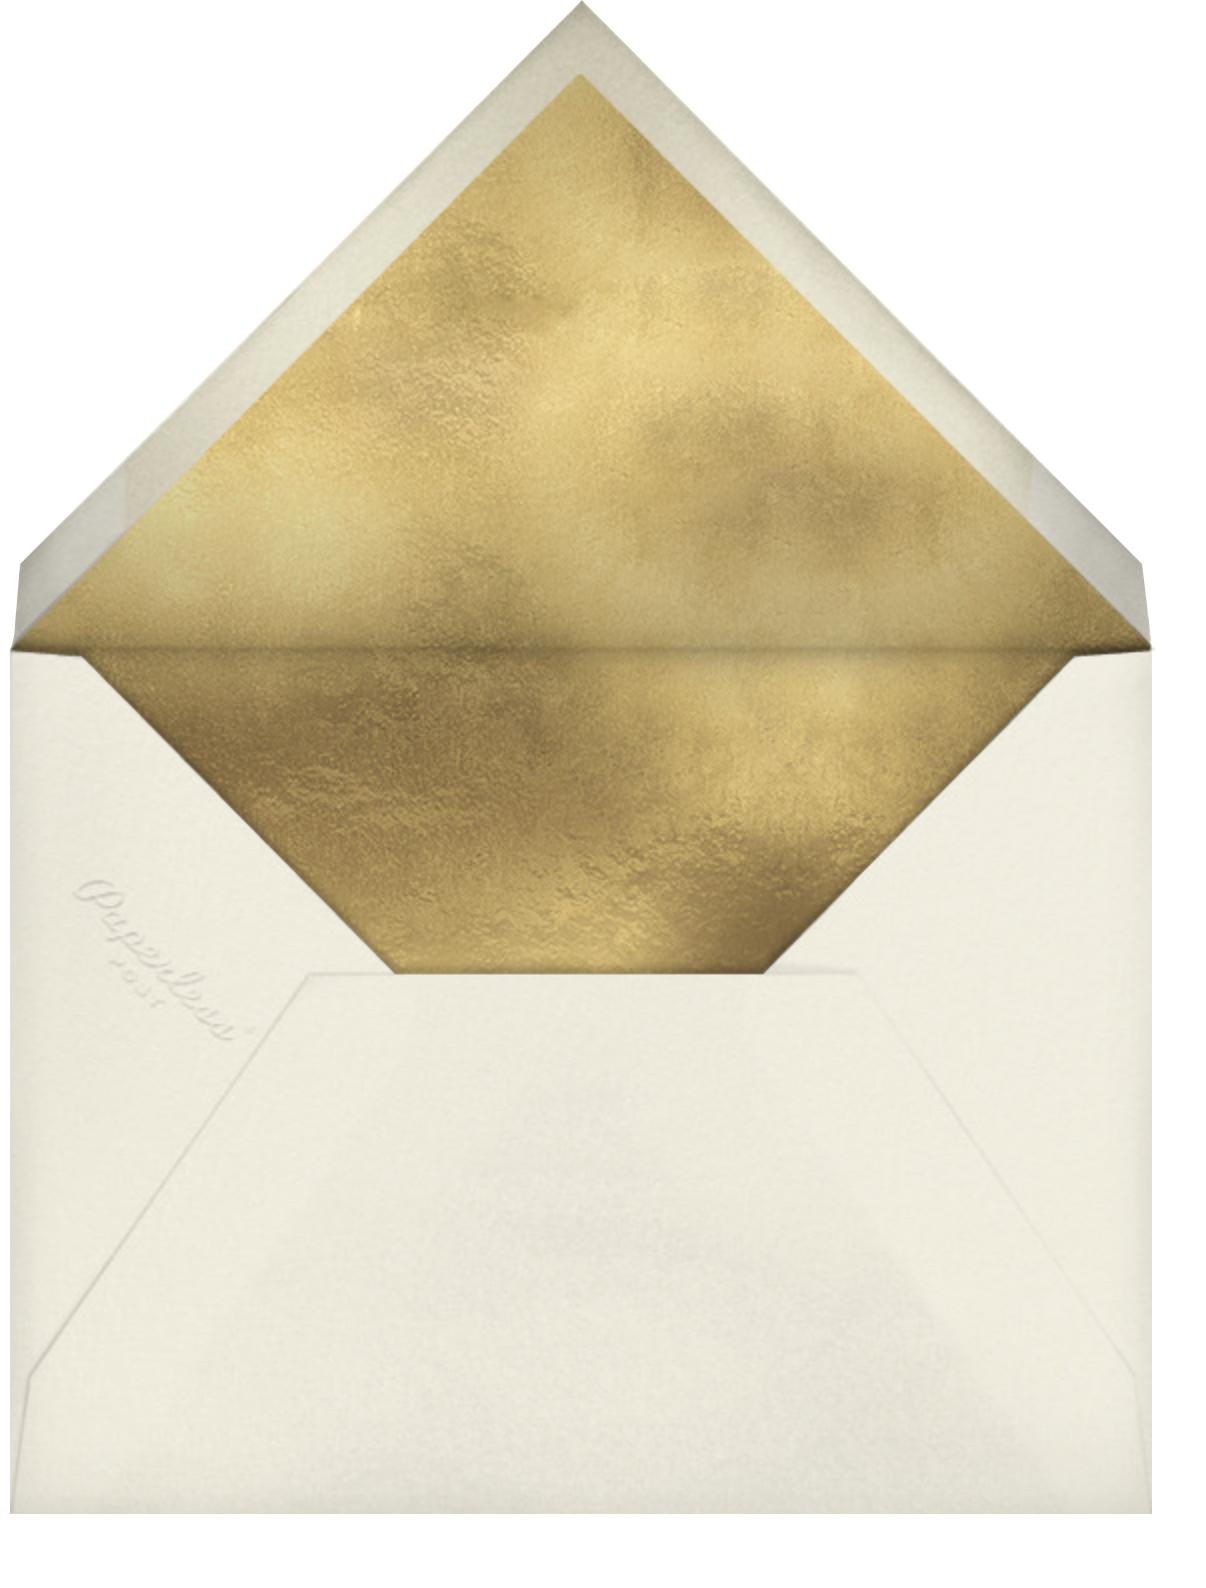 Starry Village (Blance Goméz) - Red Cap Cards - Holiday cards - envelope back